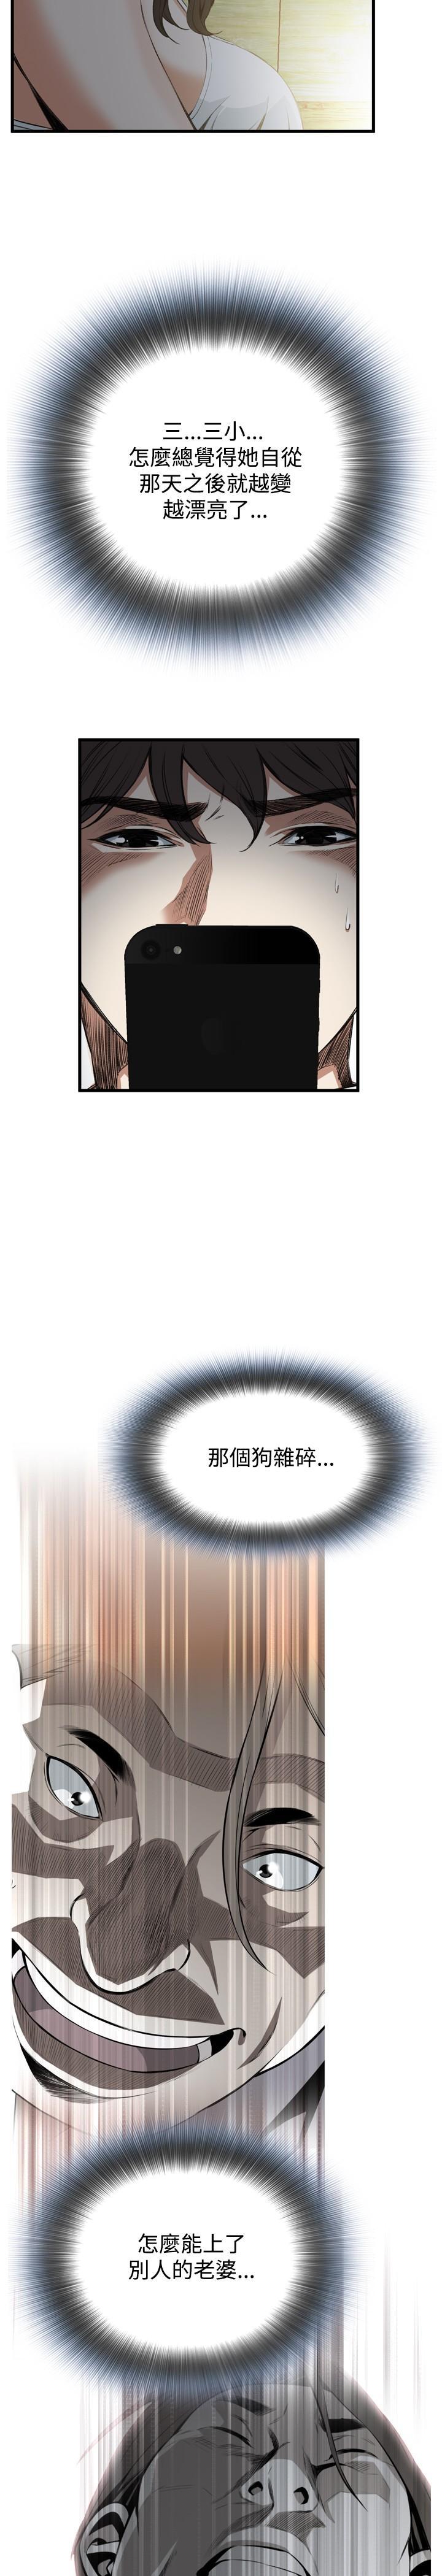 Take a Peek 偷窥 Ch.39~60 [Chinese]中文 188